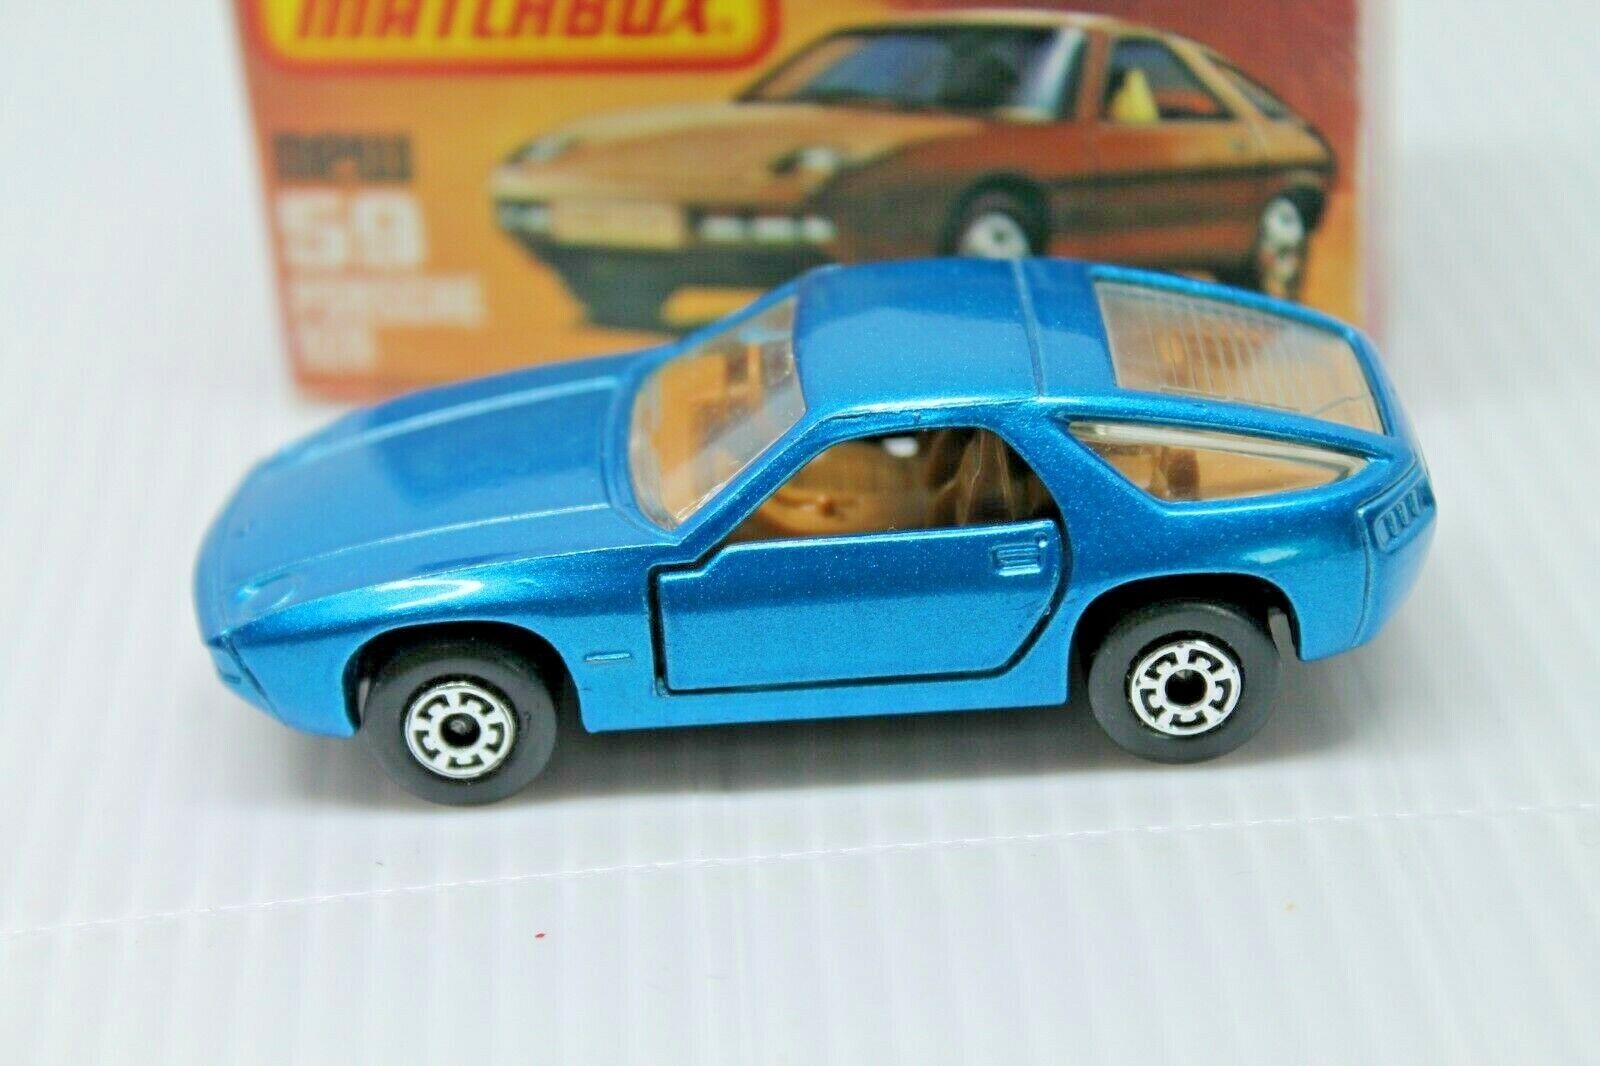 Matchbox Superfast 59  PORSCHE 928  Neuf dans sa boîte  Comme neuf  bleumetallic